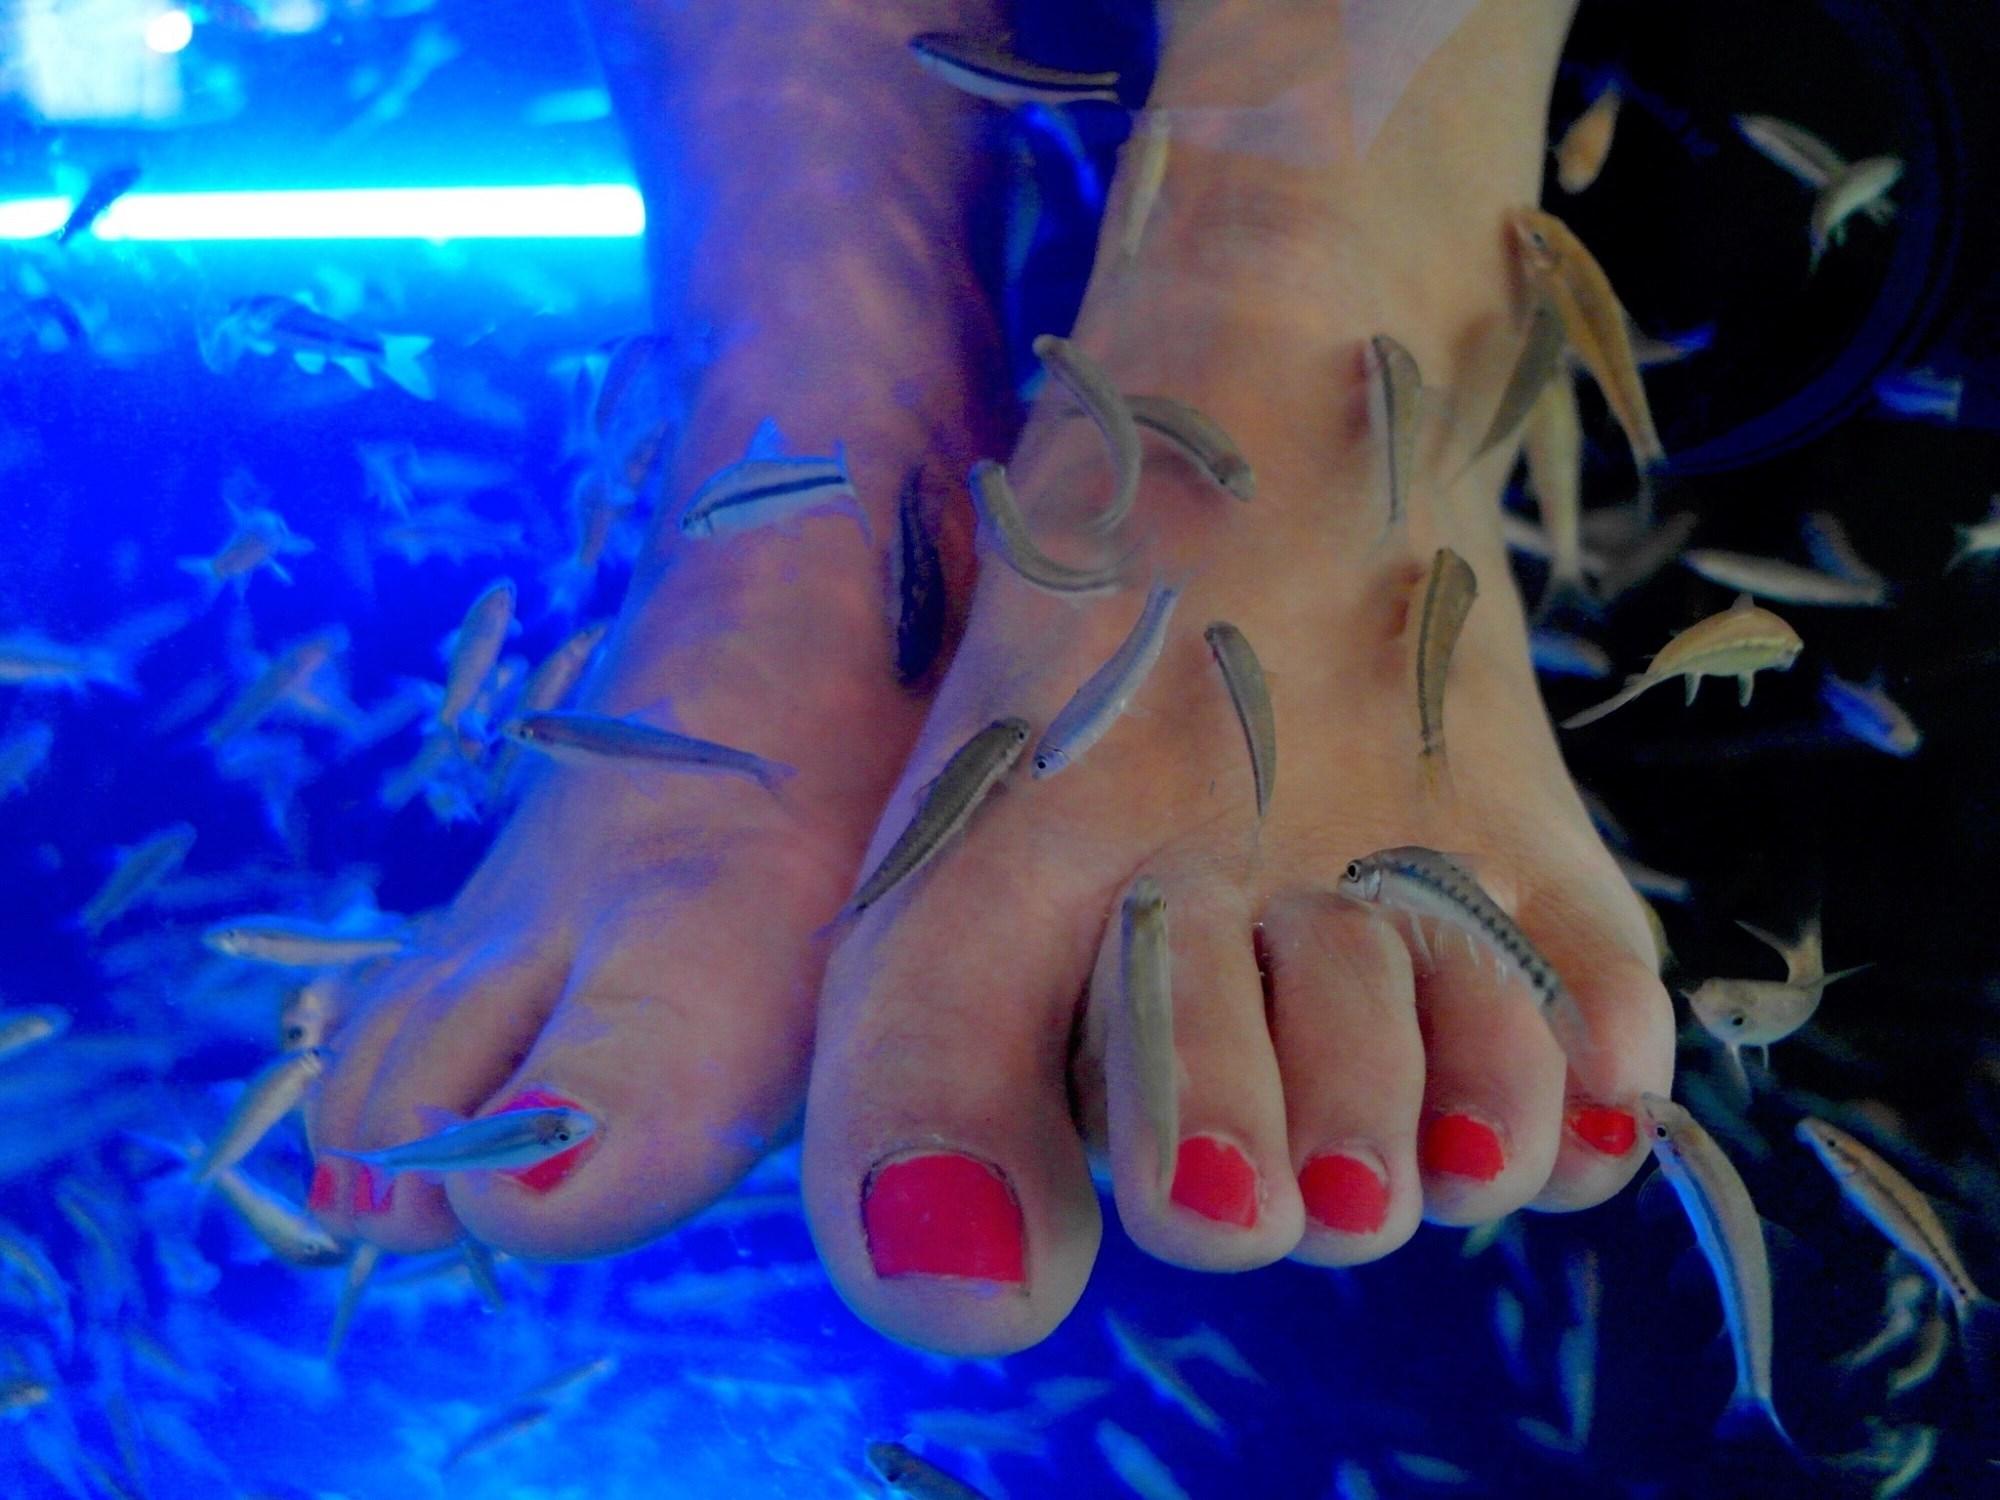 Fish Pedicure Causes Woman to Lose Toenails